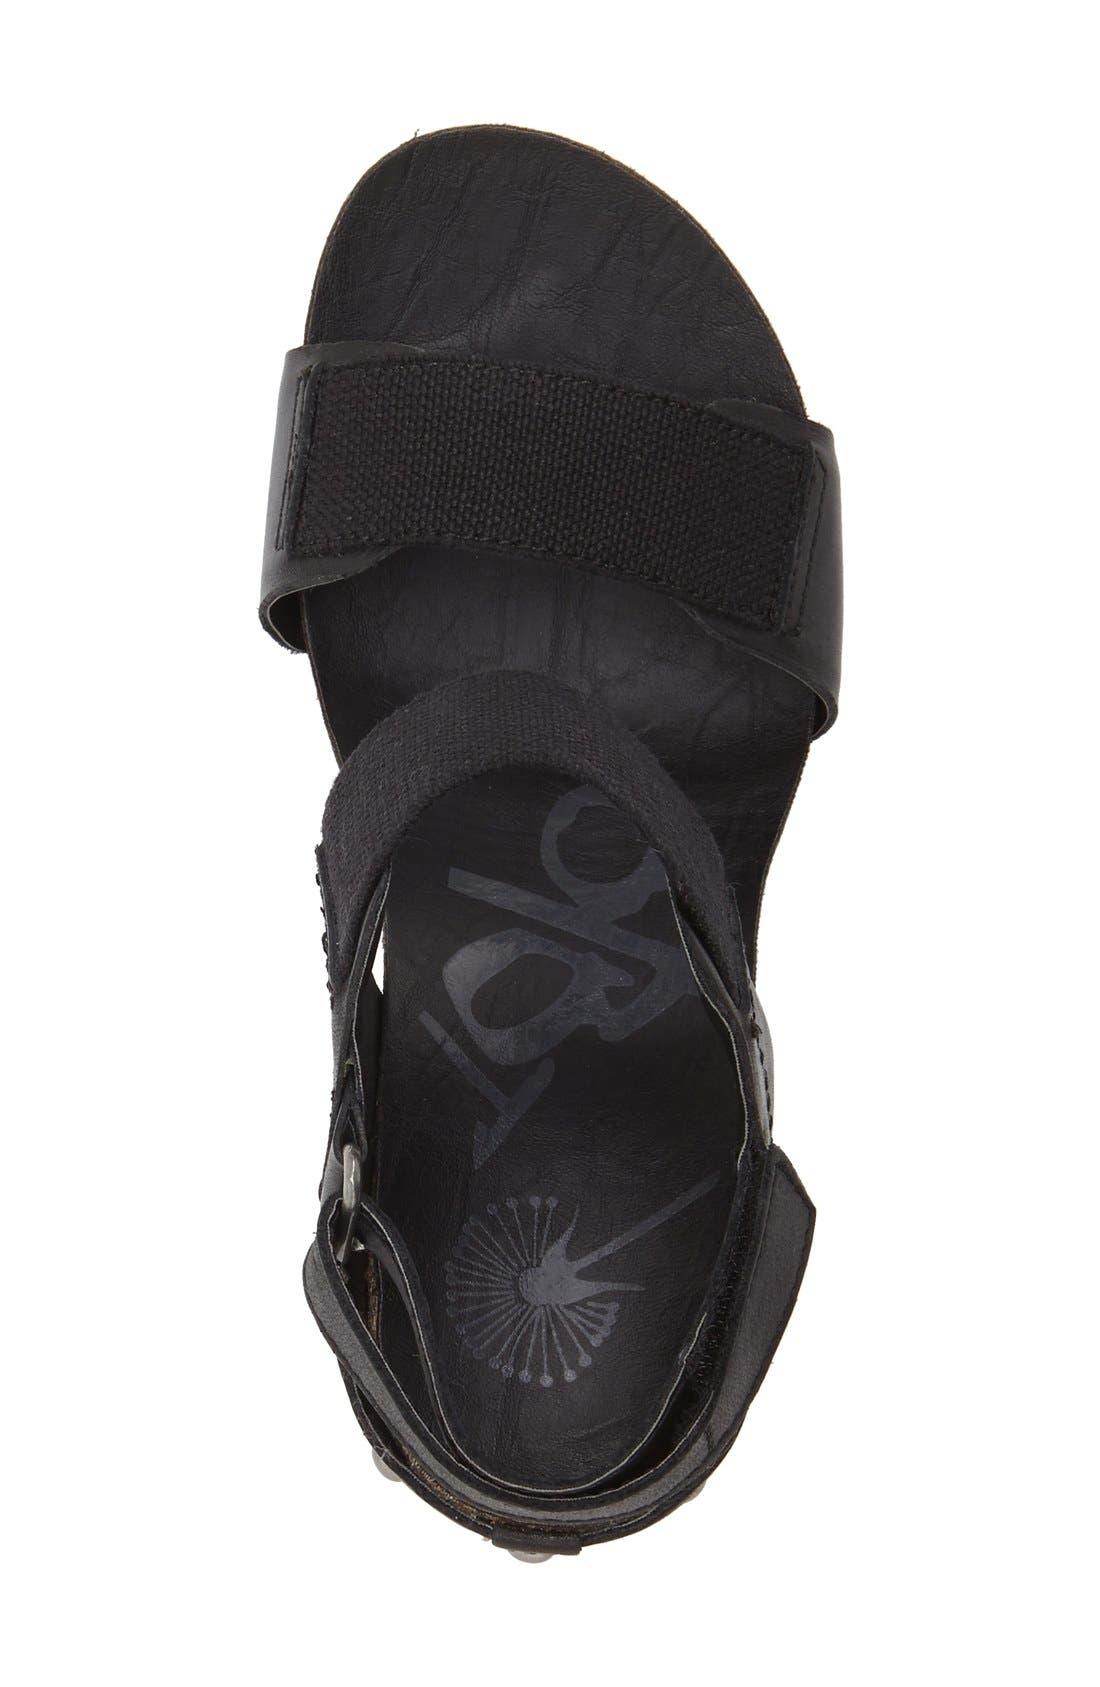 'Trailblazer' Wedge Sandal,                             Alternate thumbnail 3, color,                             Black Leather